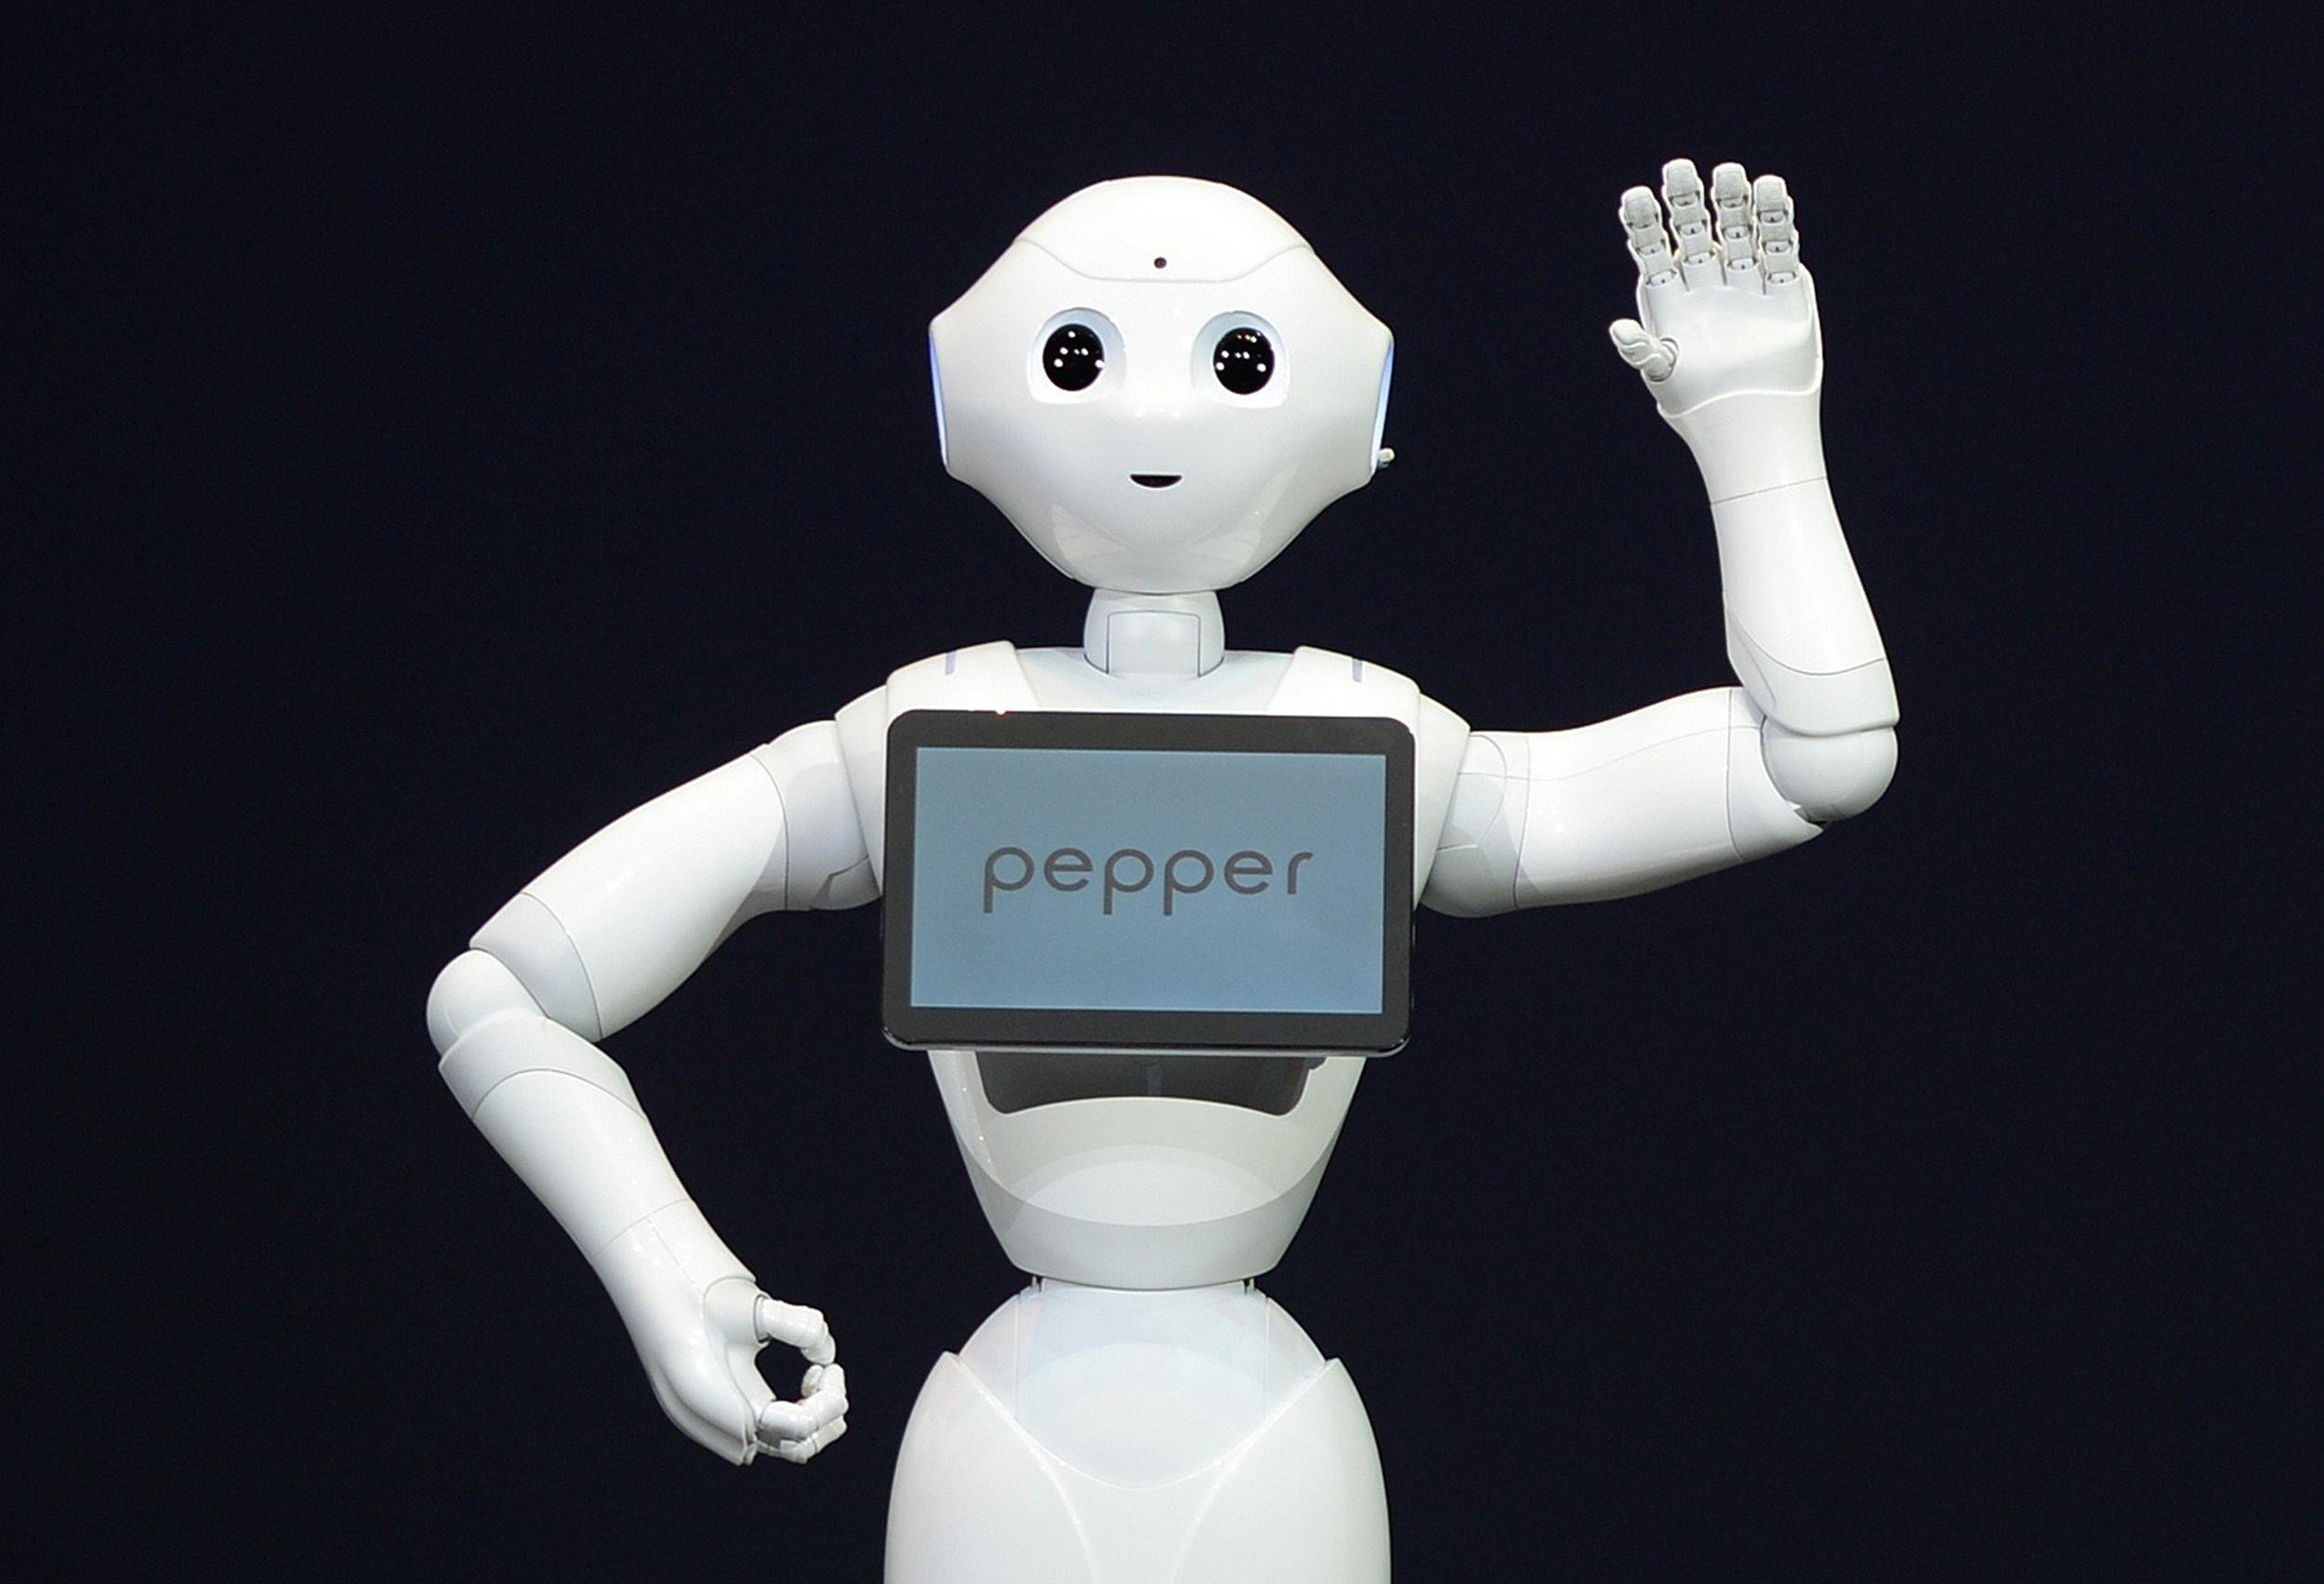 http://trendymen.ru/images/article1/119190/attachments/140605-humanoid-jms-1257_f909e2e1f8752551b981b92a45cf9071.jpg